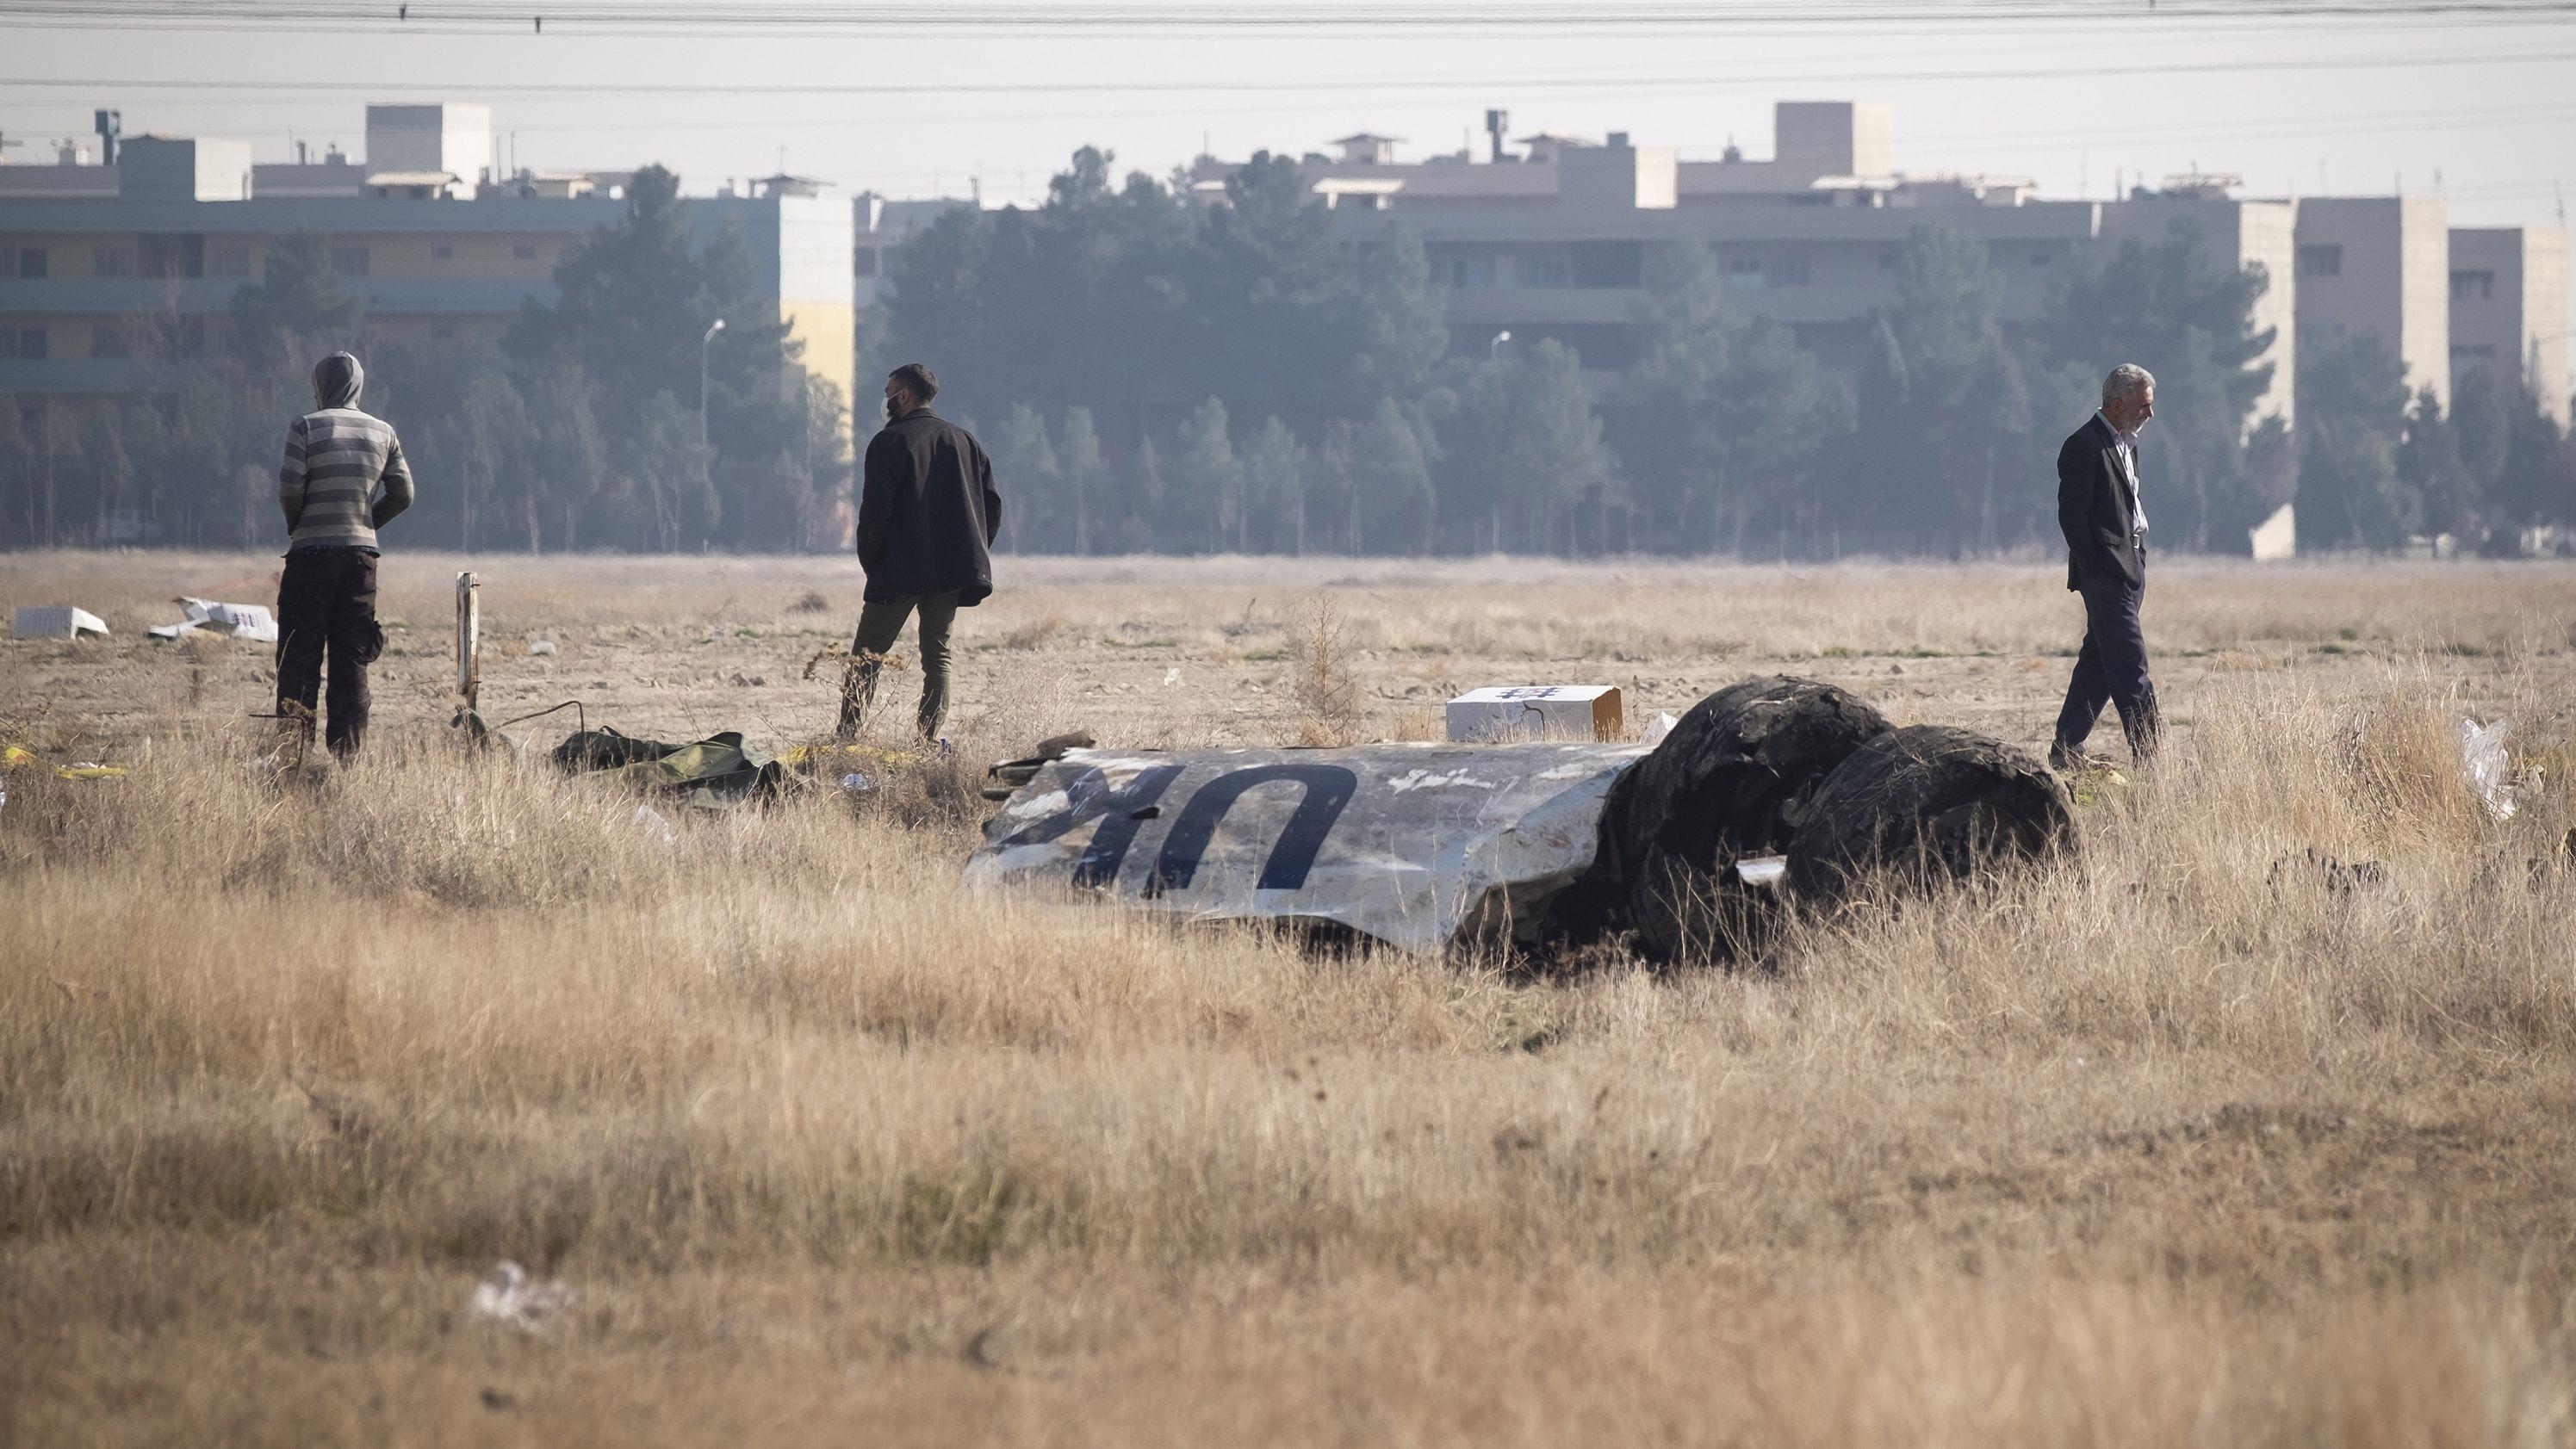 Wrackteil der abgestürzten Passagiermaschine nahe Teheran